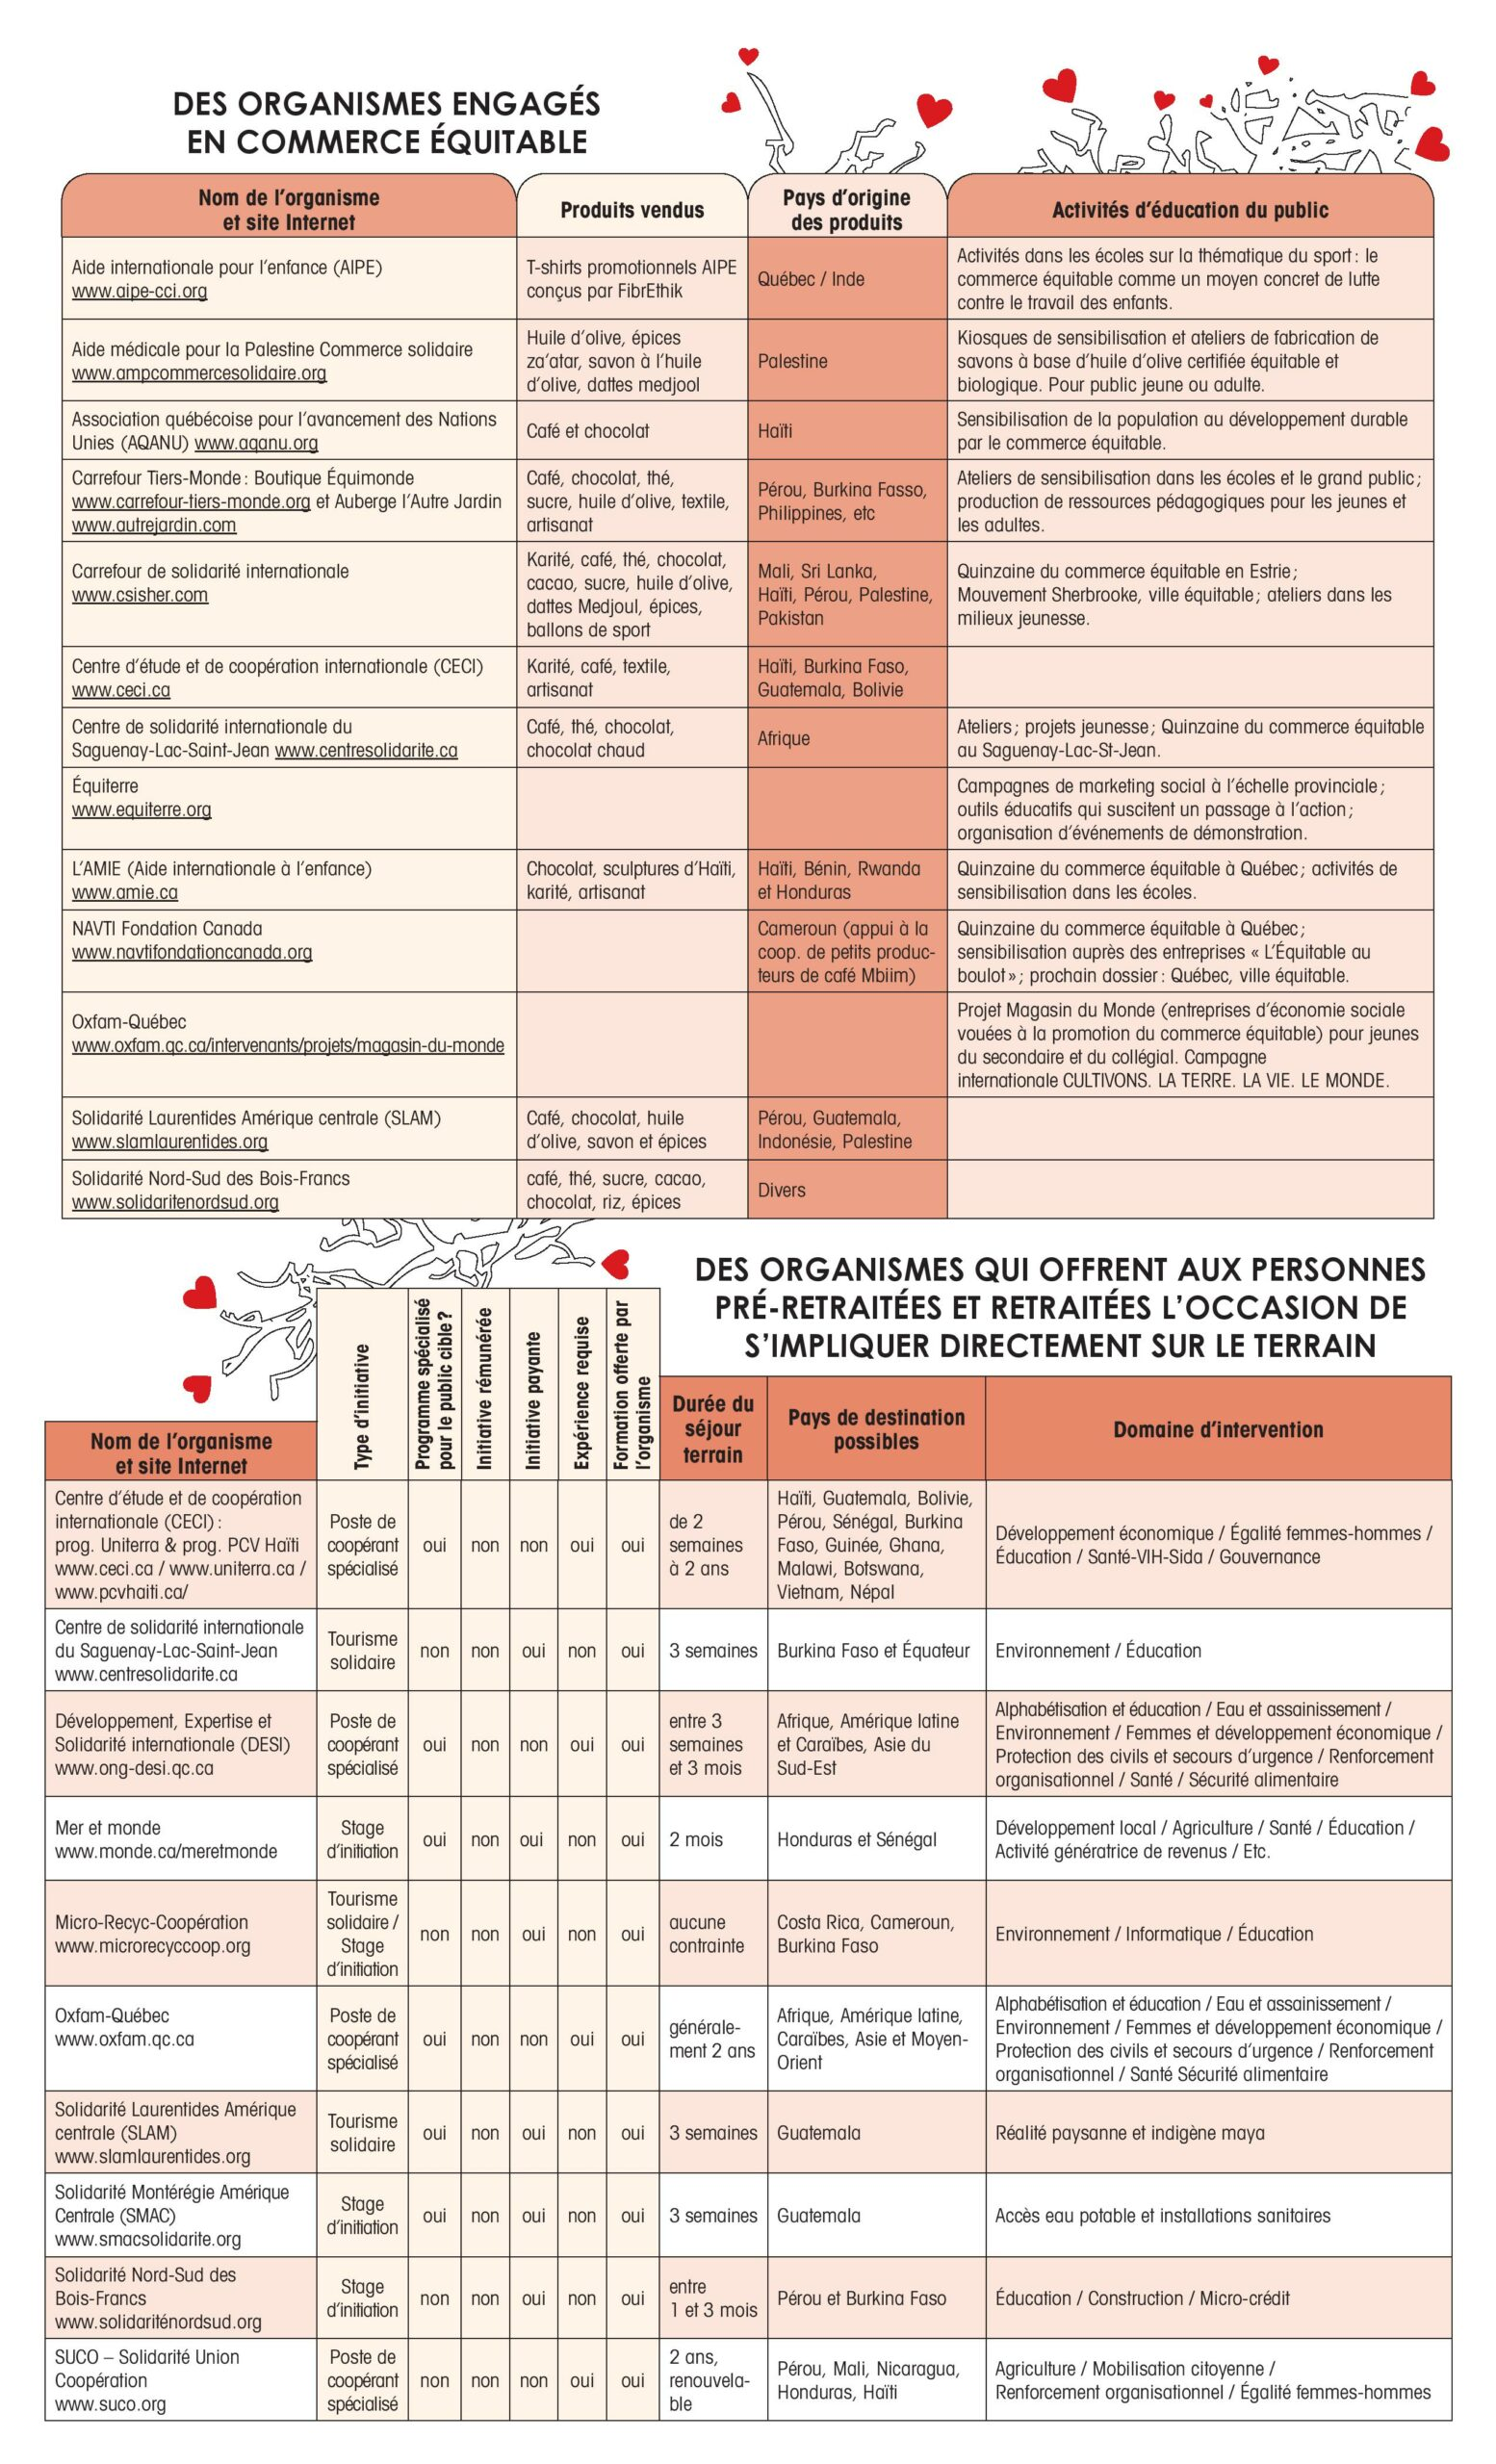 Semaine du développement international (SDI) 2013